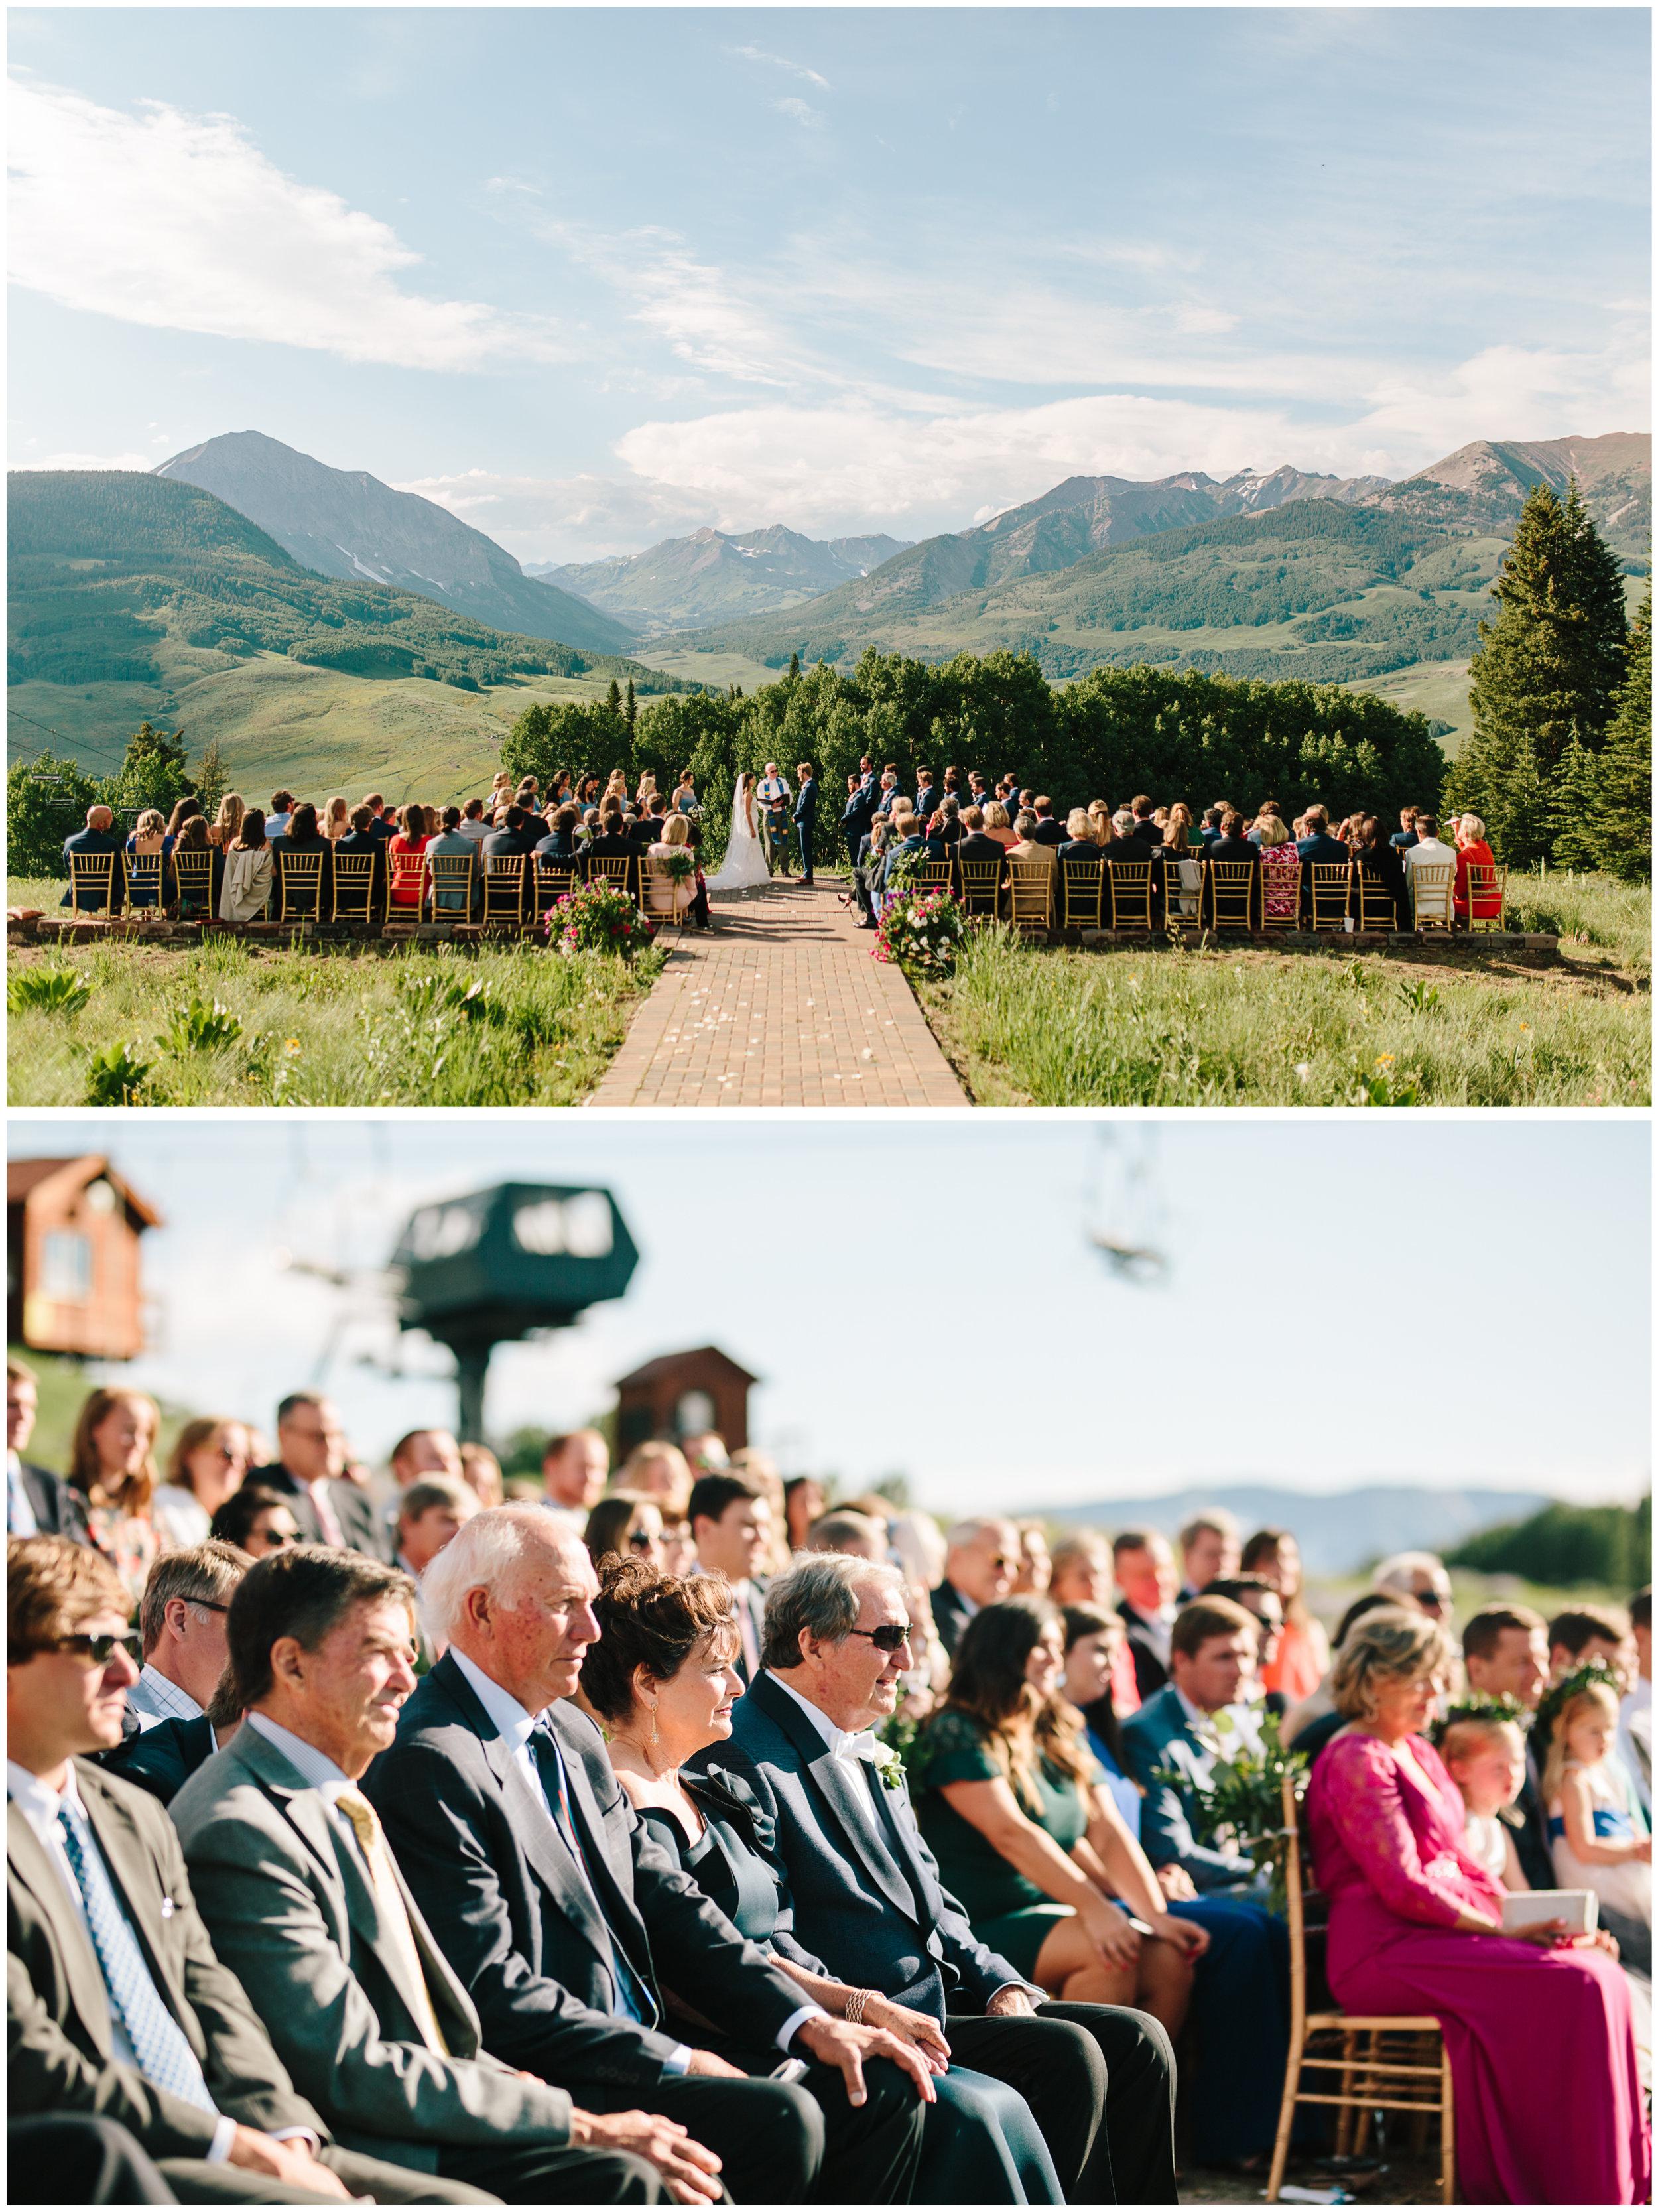 crested_butte_wedding_86.jpg